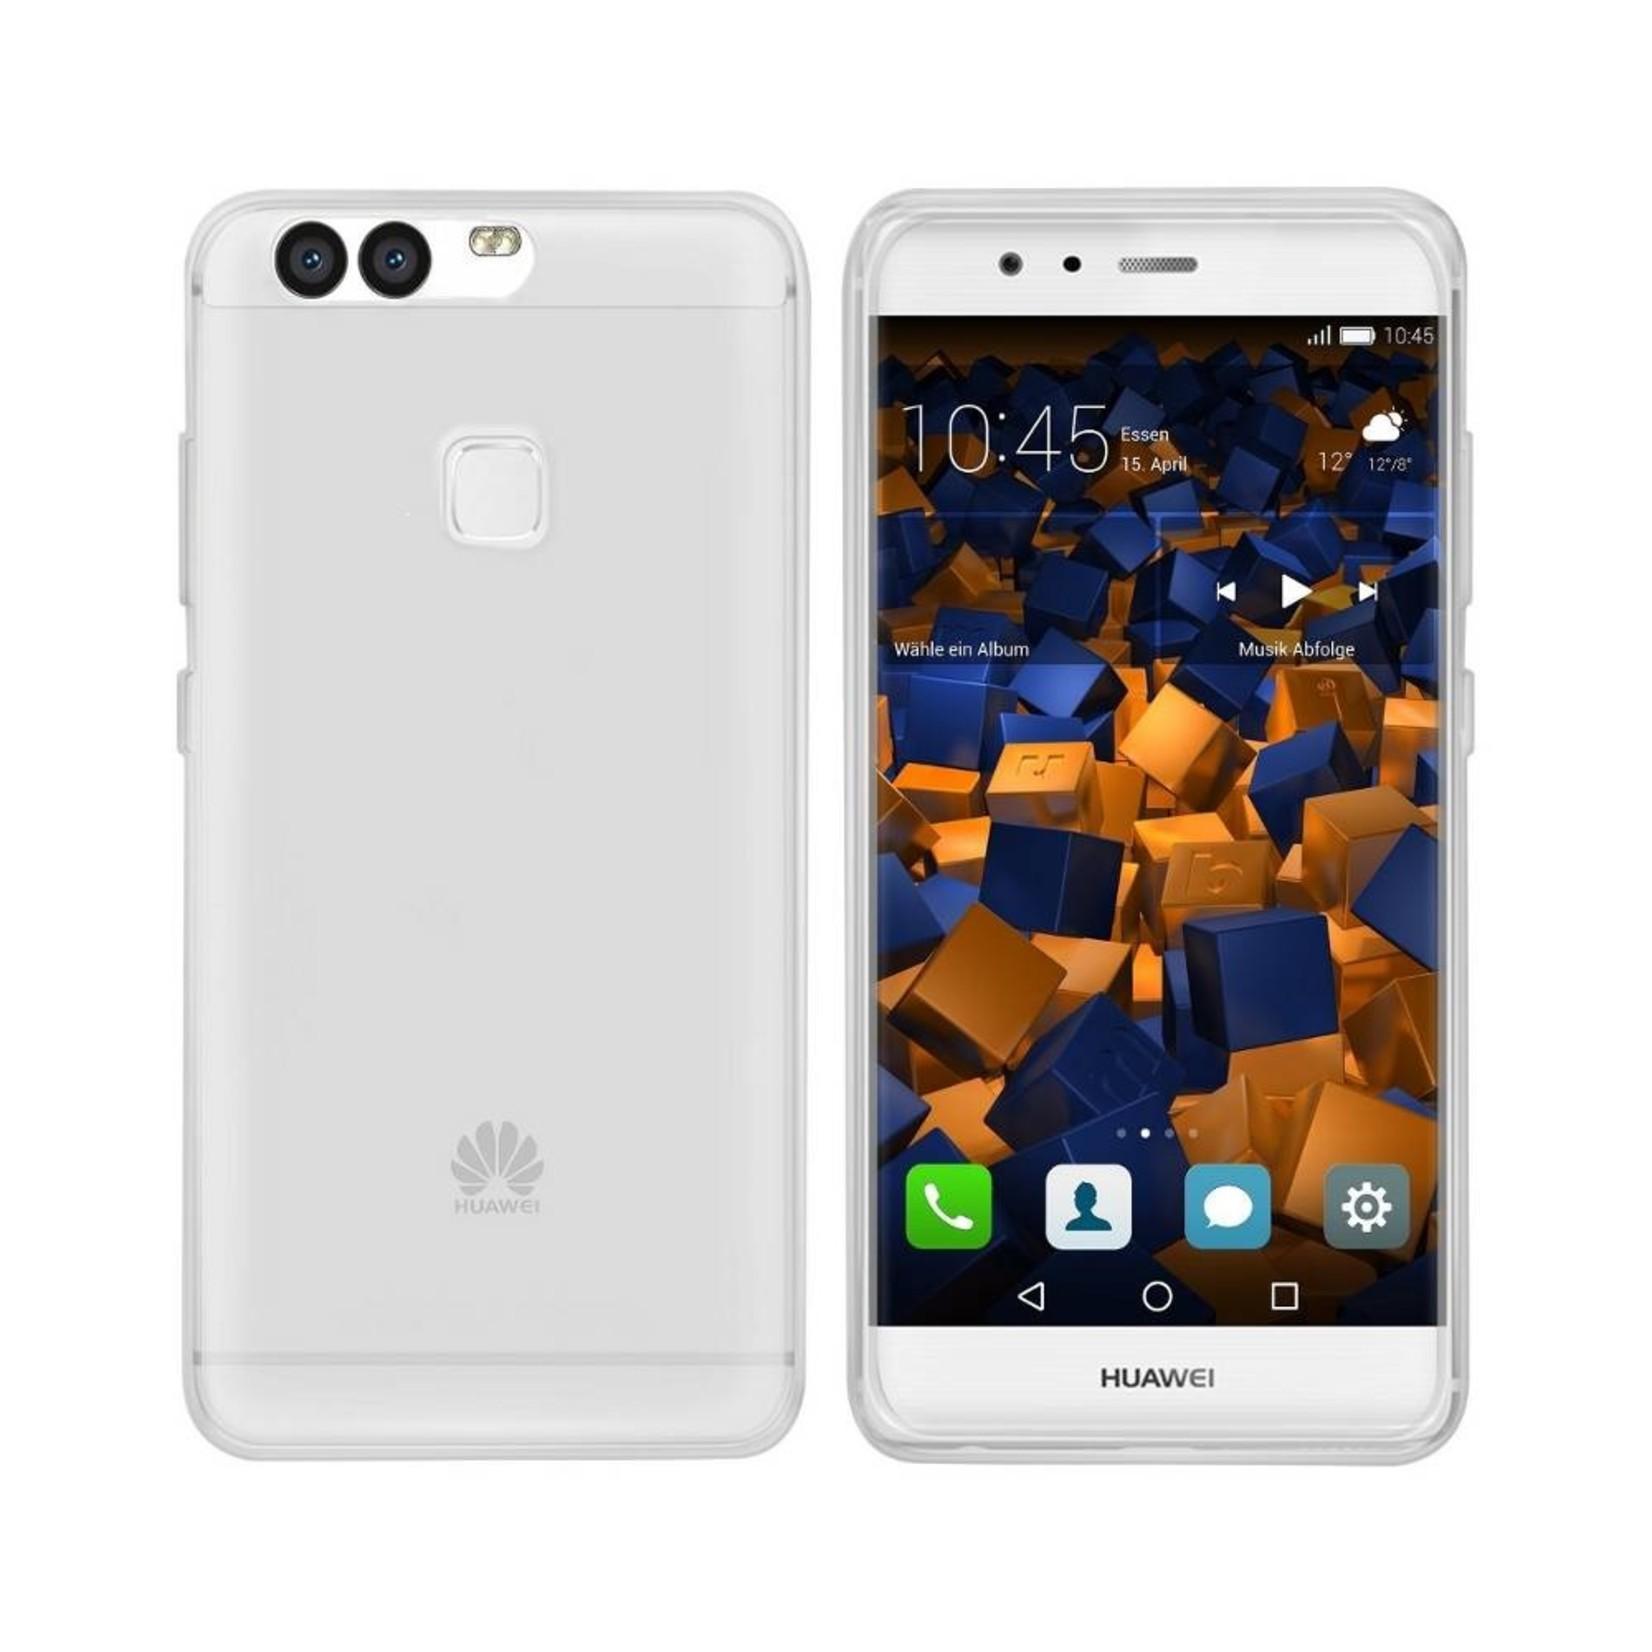 Colorfone Hoesje CoolSkin3T voor Huawei P9 Plus Tr. Wit